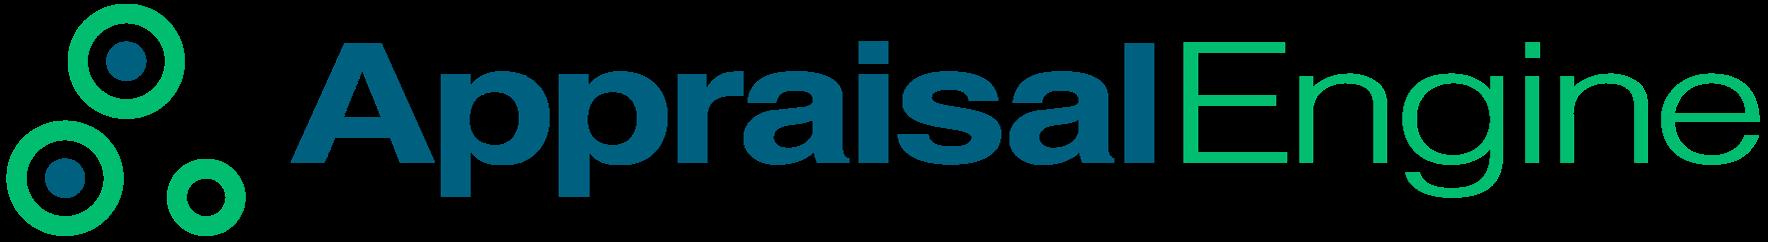 Total Loss Appraisals – Appraisal Engine Inc